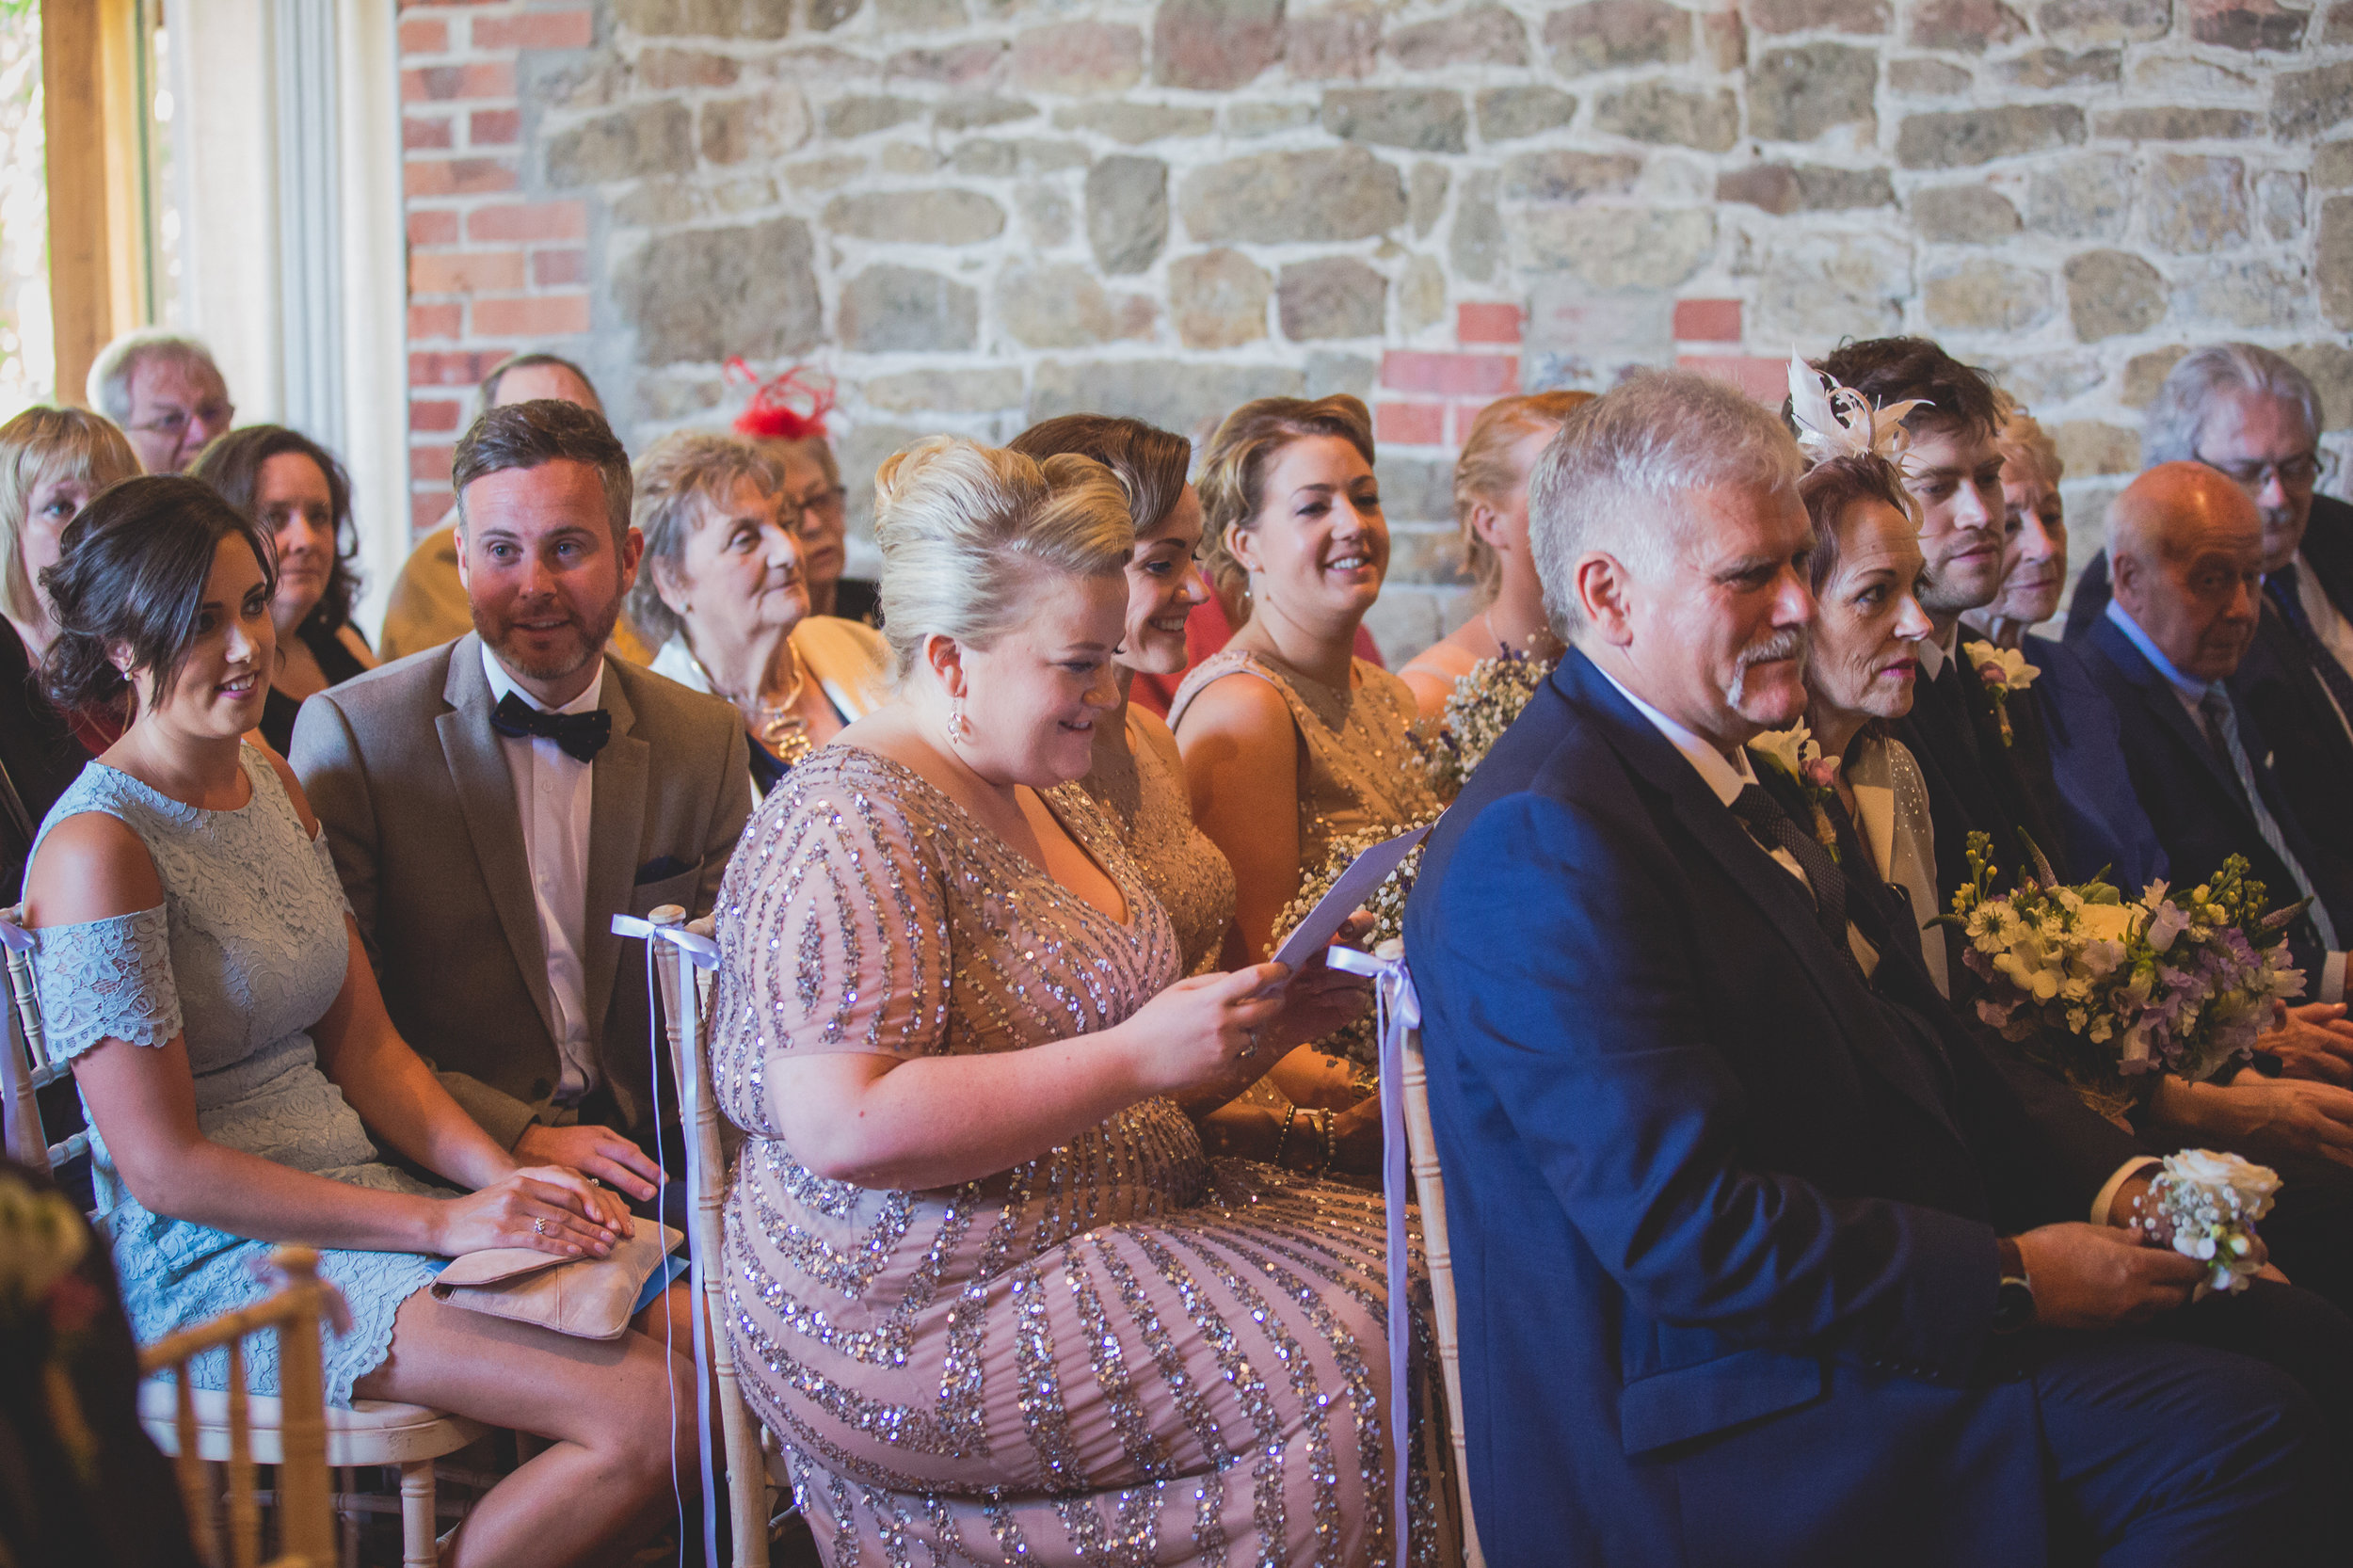 Grittenham Barn female wedding photographers west sussex petworth social-64.jpg